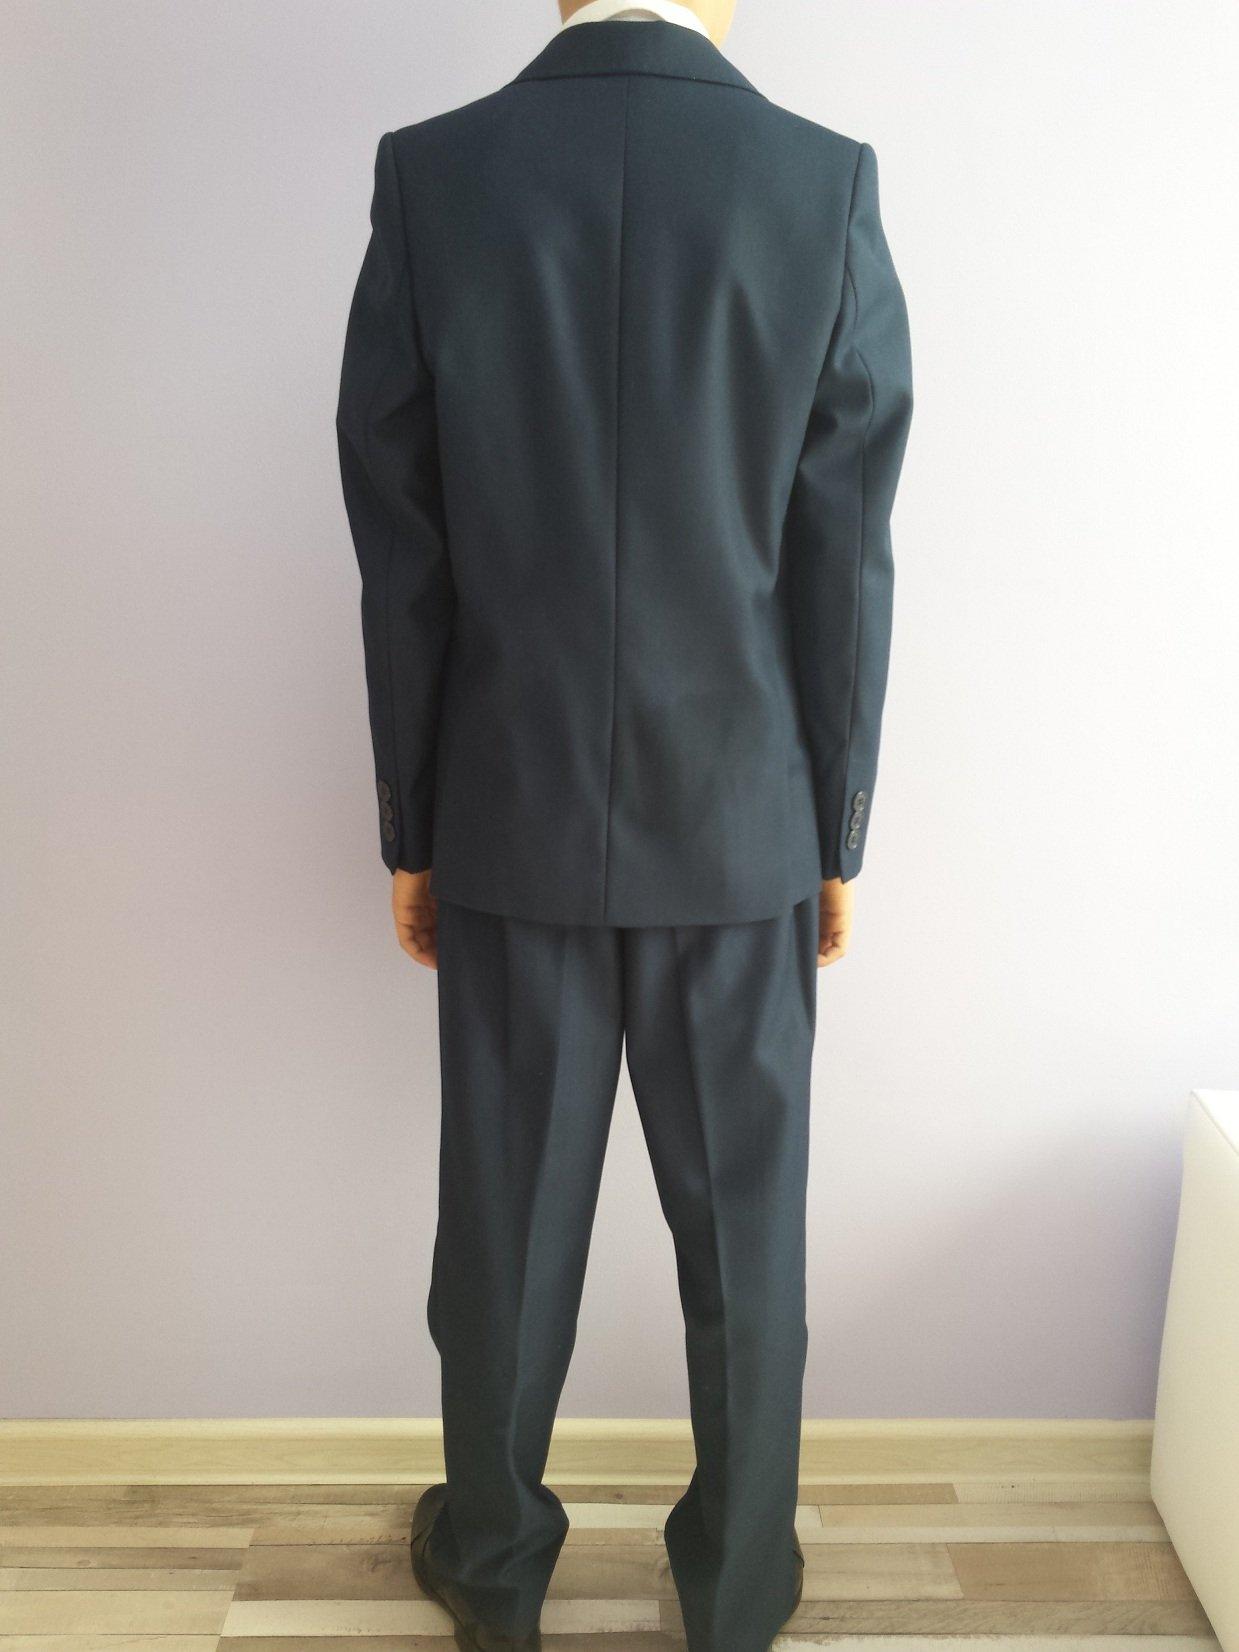 96adffdf1423e Garnitur chłopięcy 128 cm komplet +koszula+ buty - 7295075421 ...